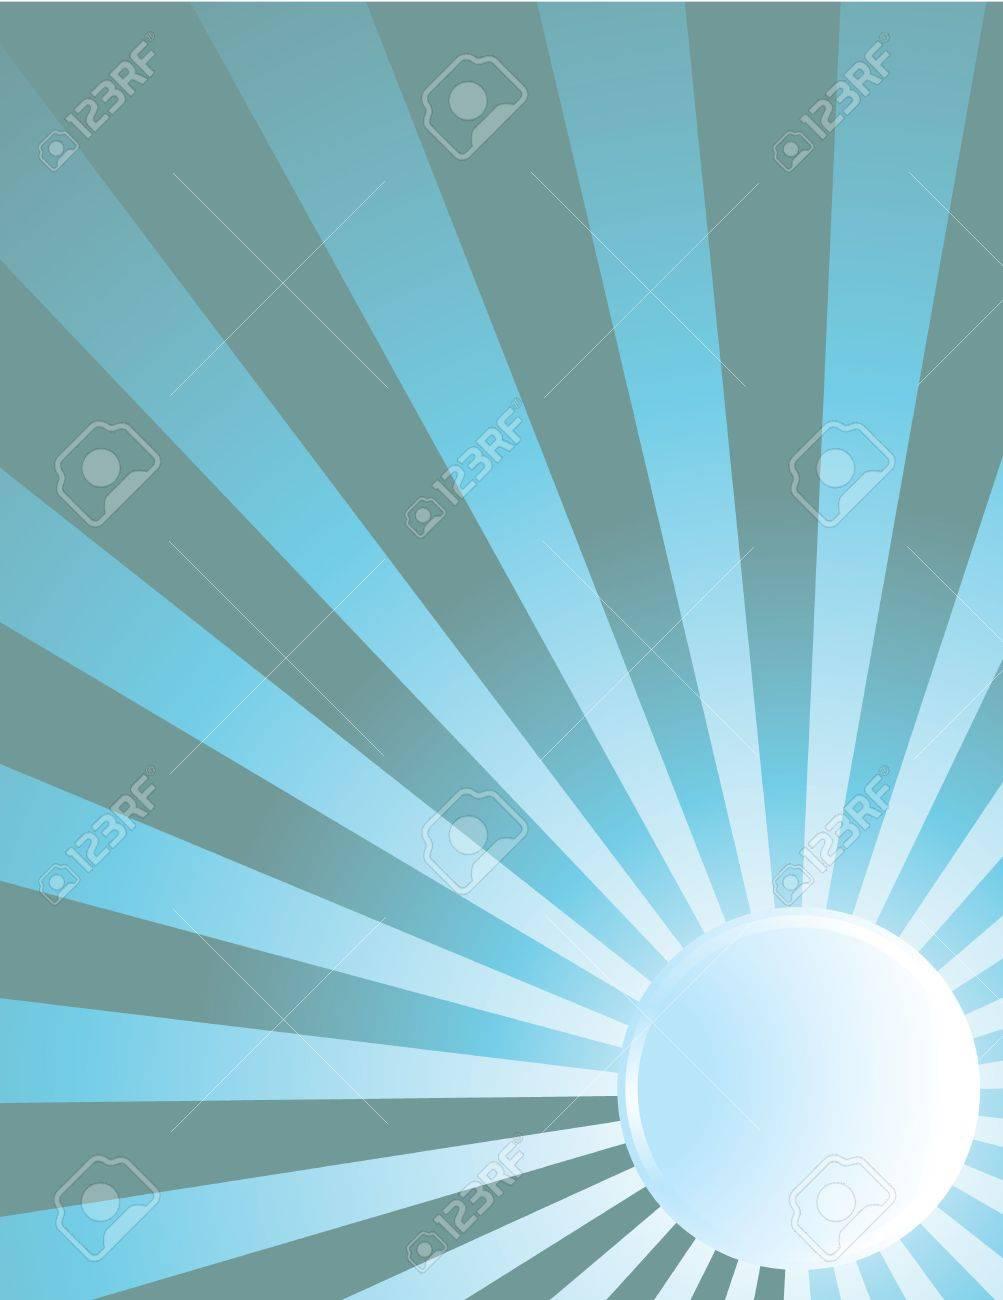 Blue moon beam ray background - 5253612